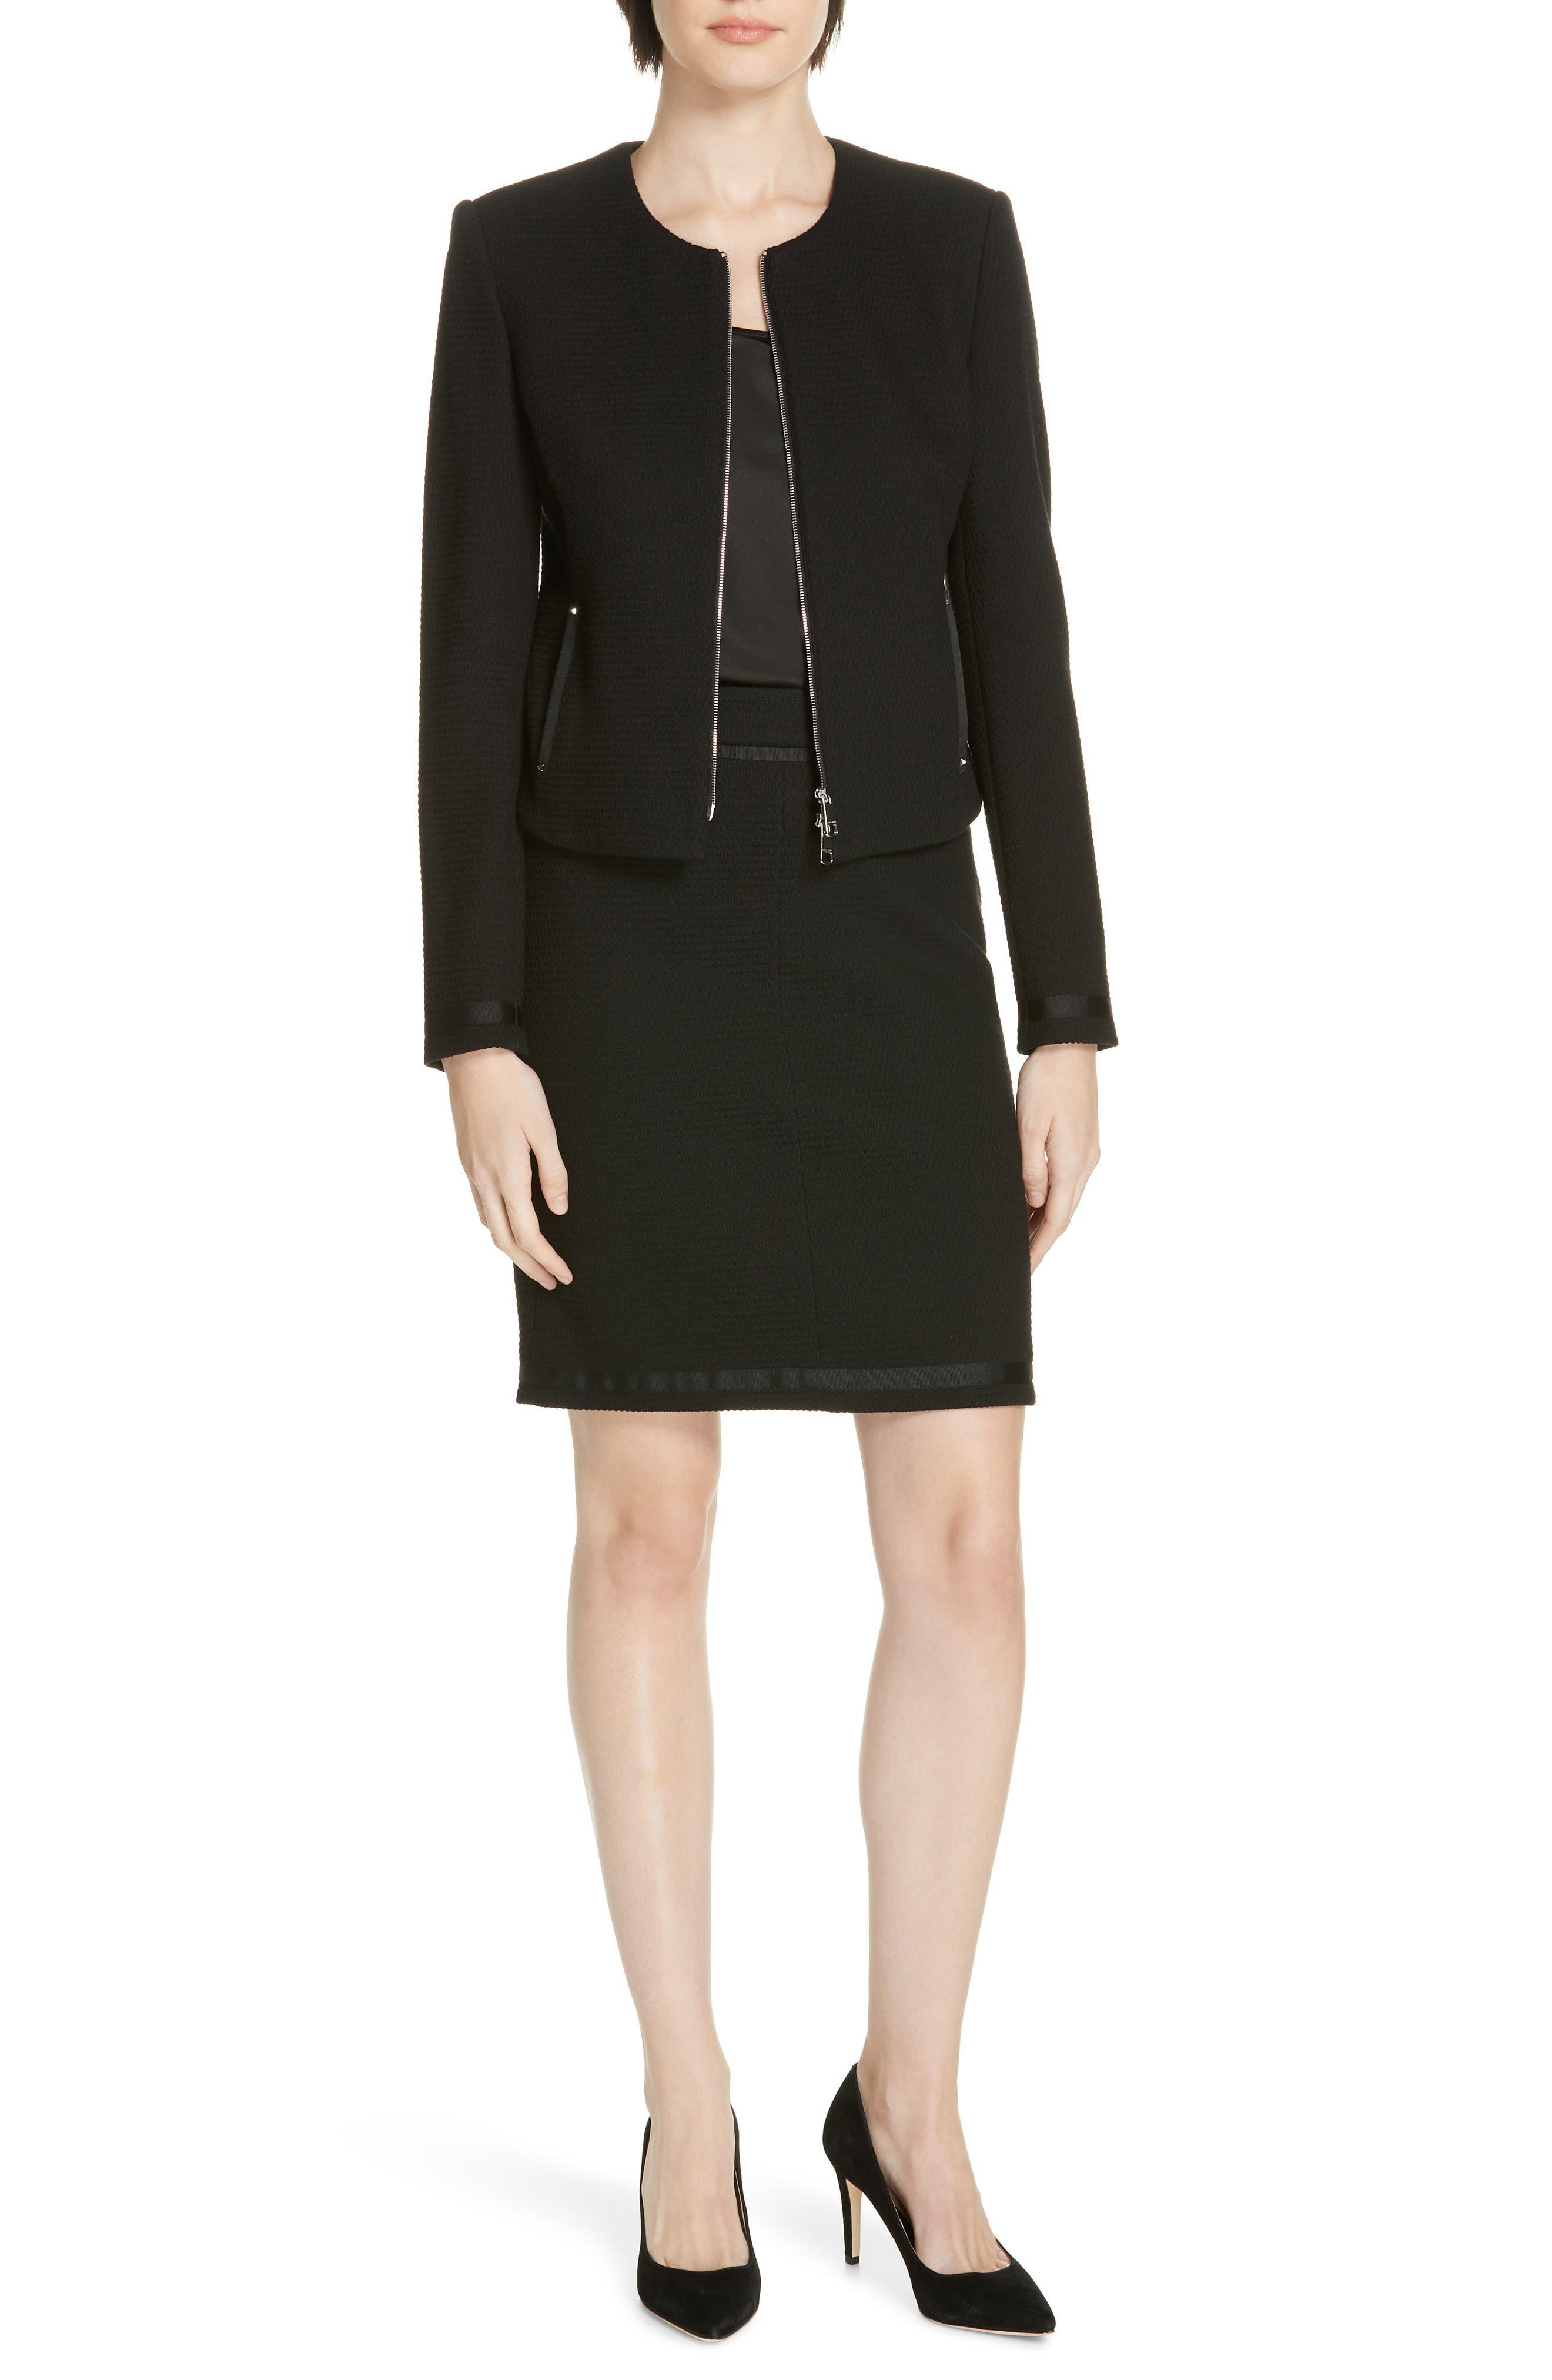 Kemio Textured Jersey Suit Jacket,                             Alternate thumbnail 7, color,                             BLACK